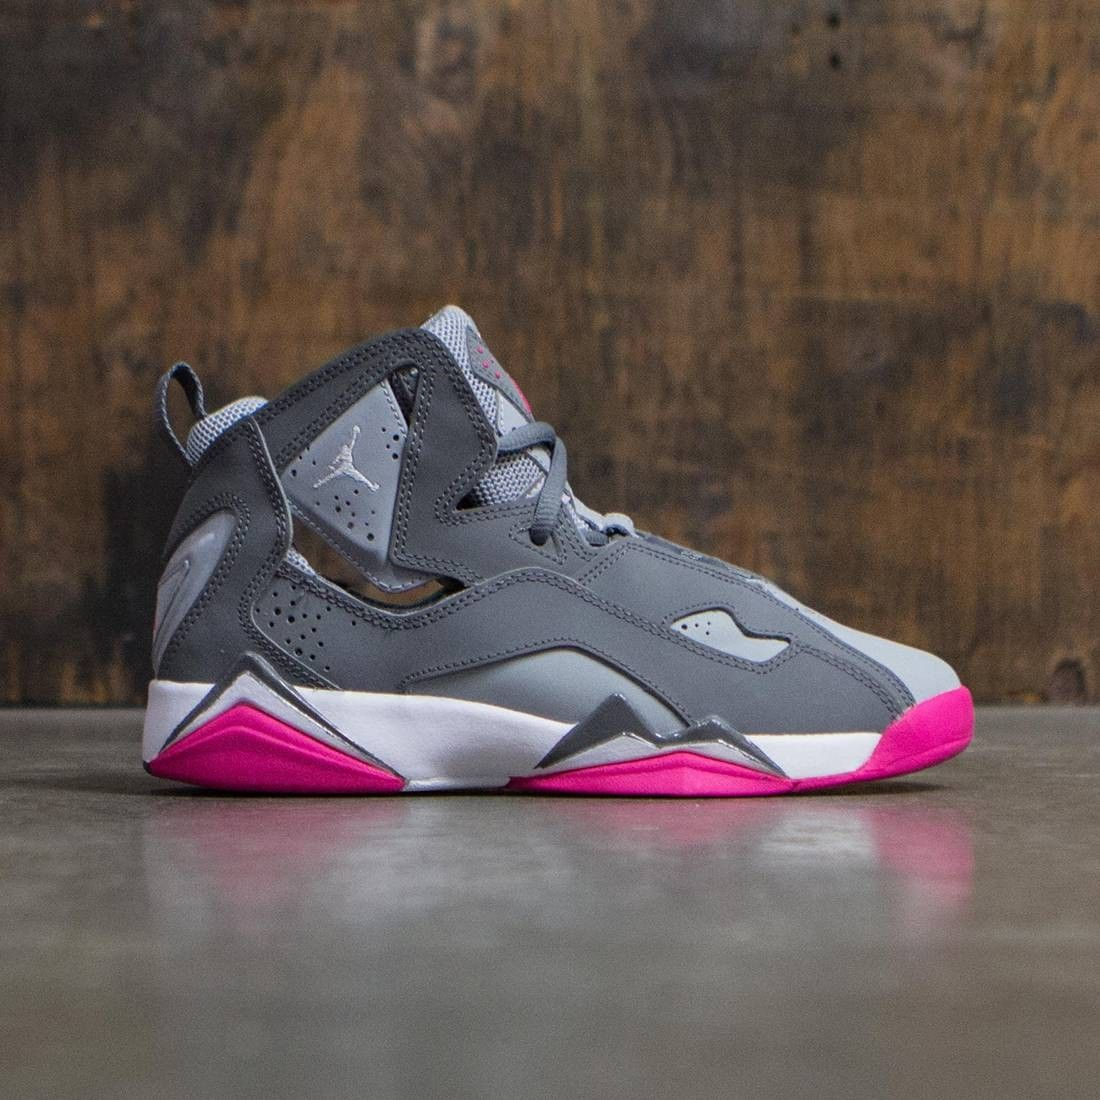 fec87a9c5eed Jordan Big Kids Girls  Jordan True Flight (GS) (cool grey   white-wolf grey-vivid  pink)